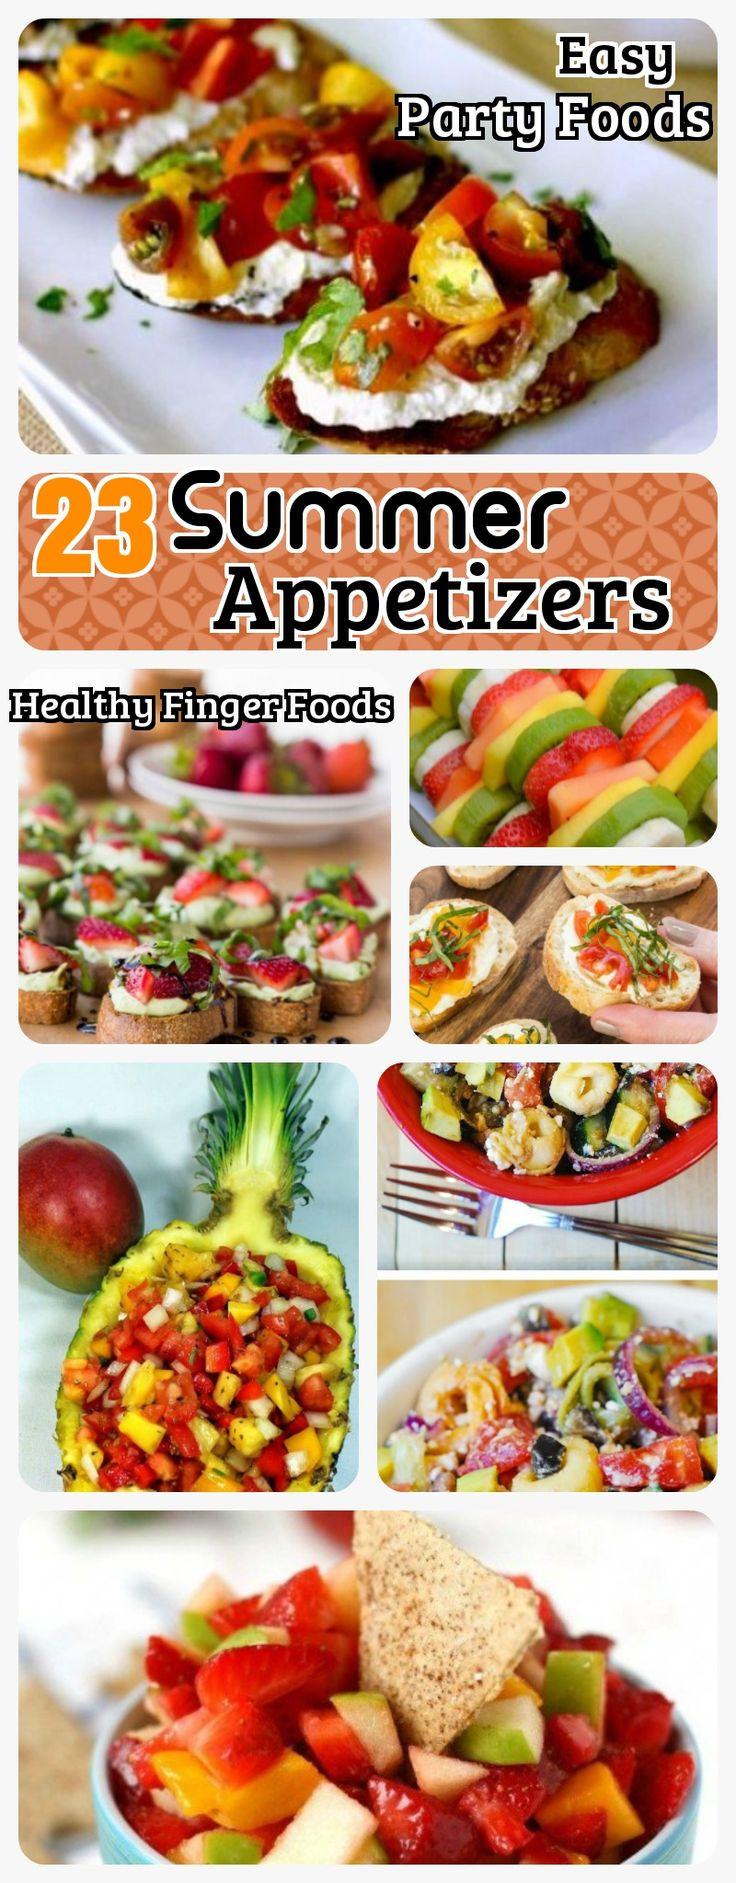 Summertime Snacks Recipe  Best 25 Easy summer appetizers ideas on Pinterest